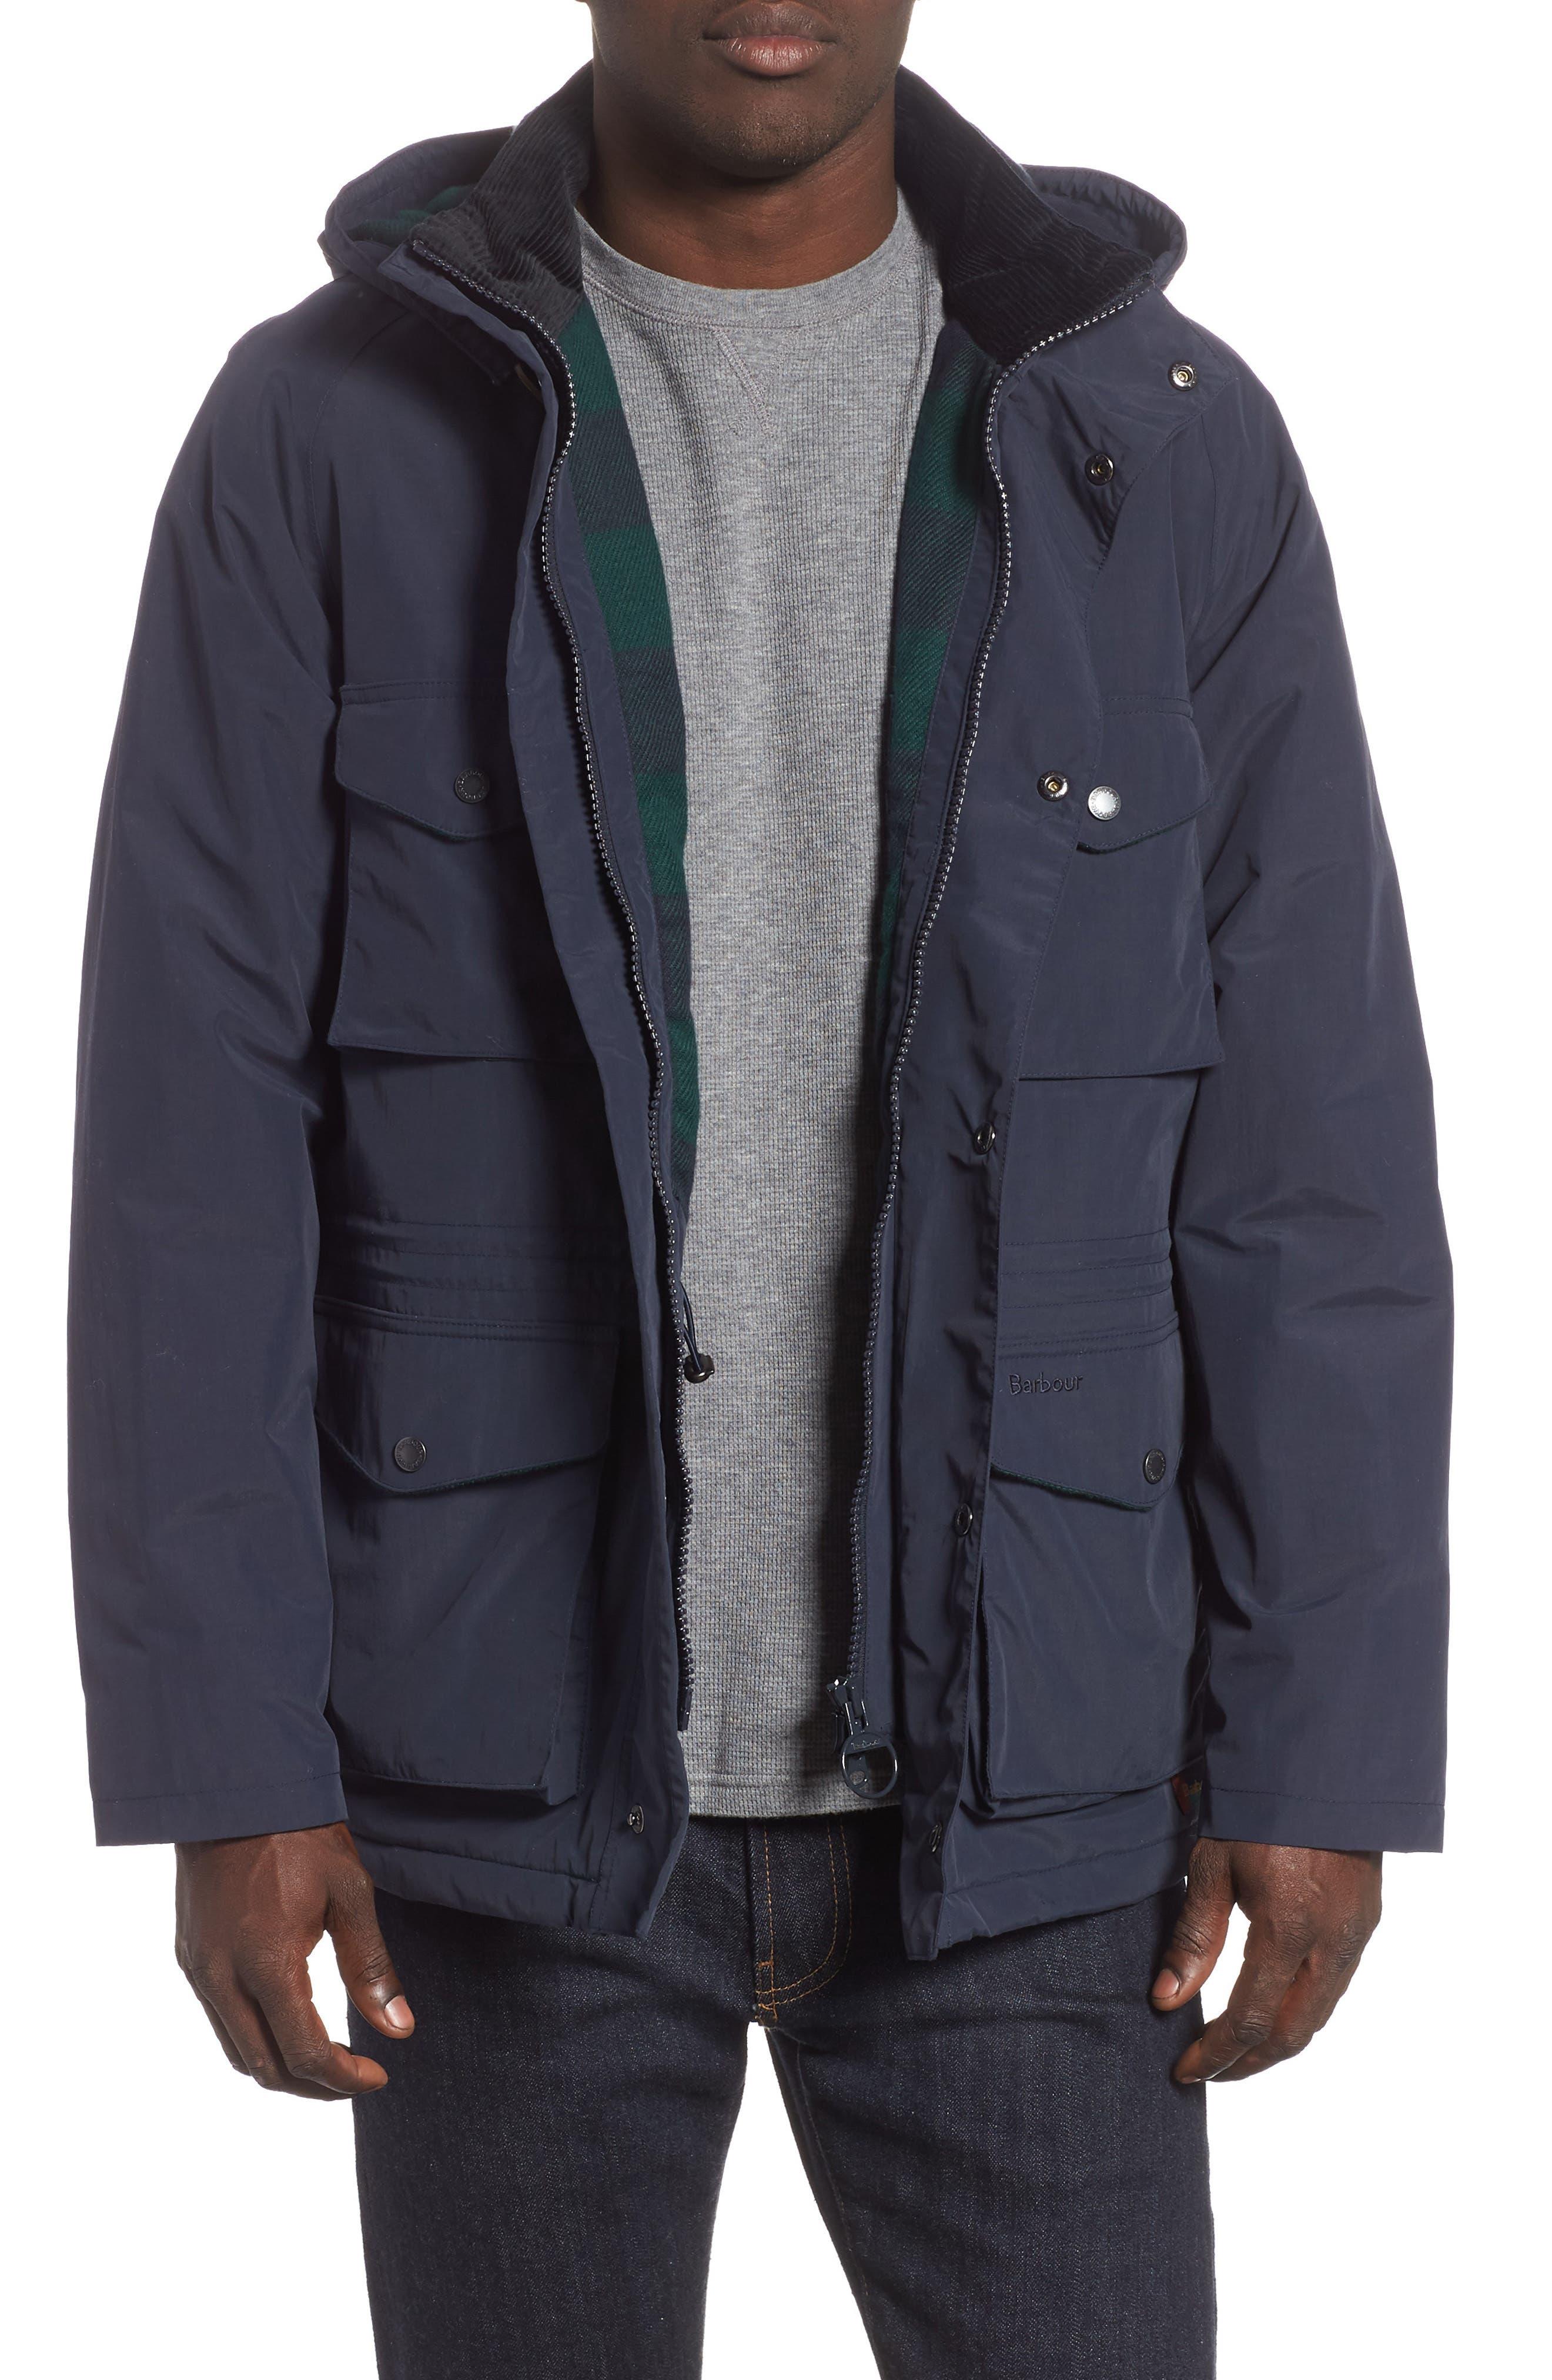 BARBOUR Tiree Waterproof Jacket, Main, color, 410